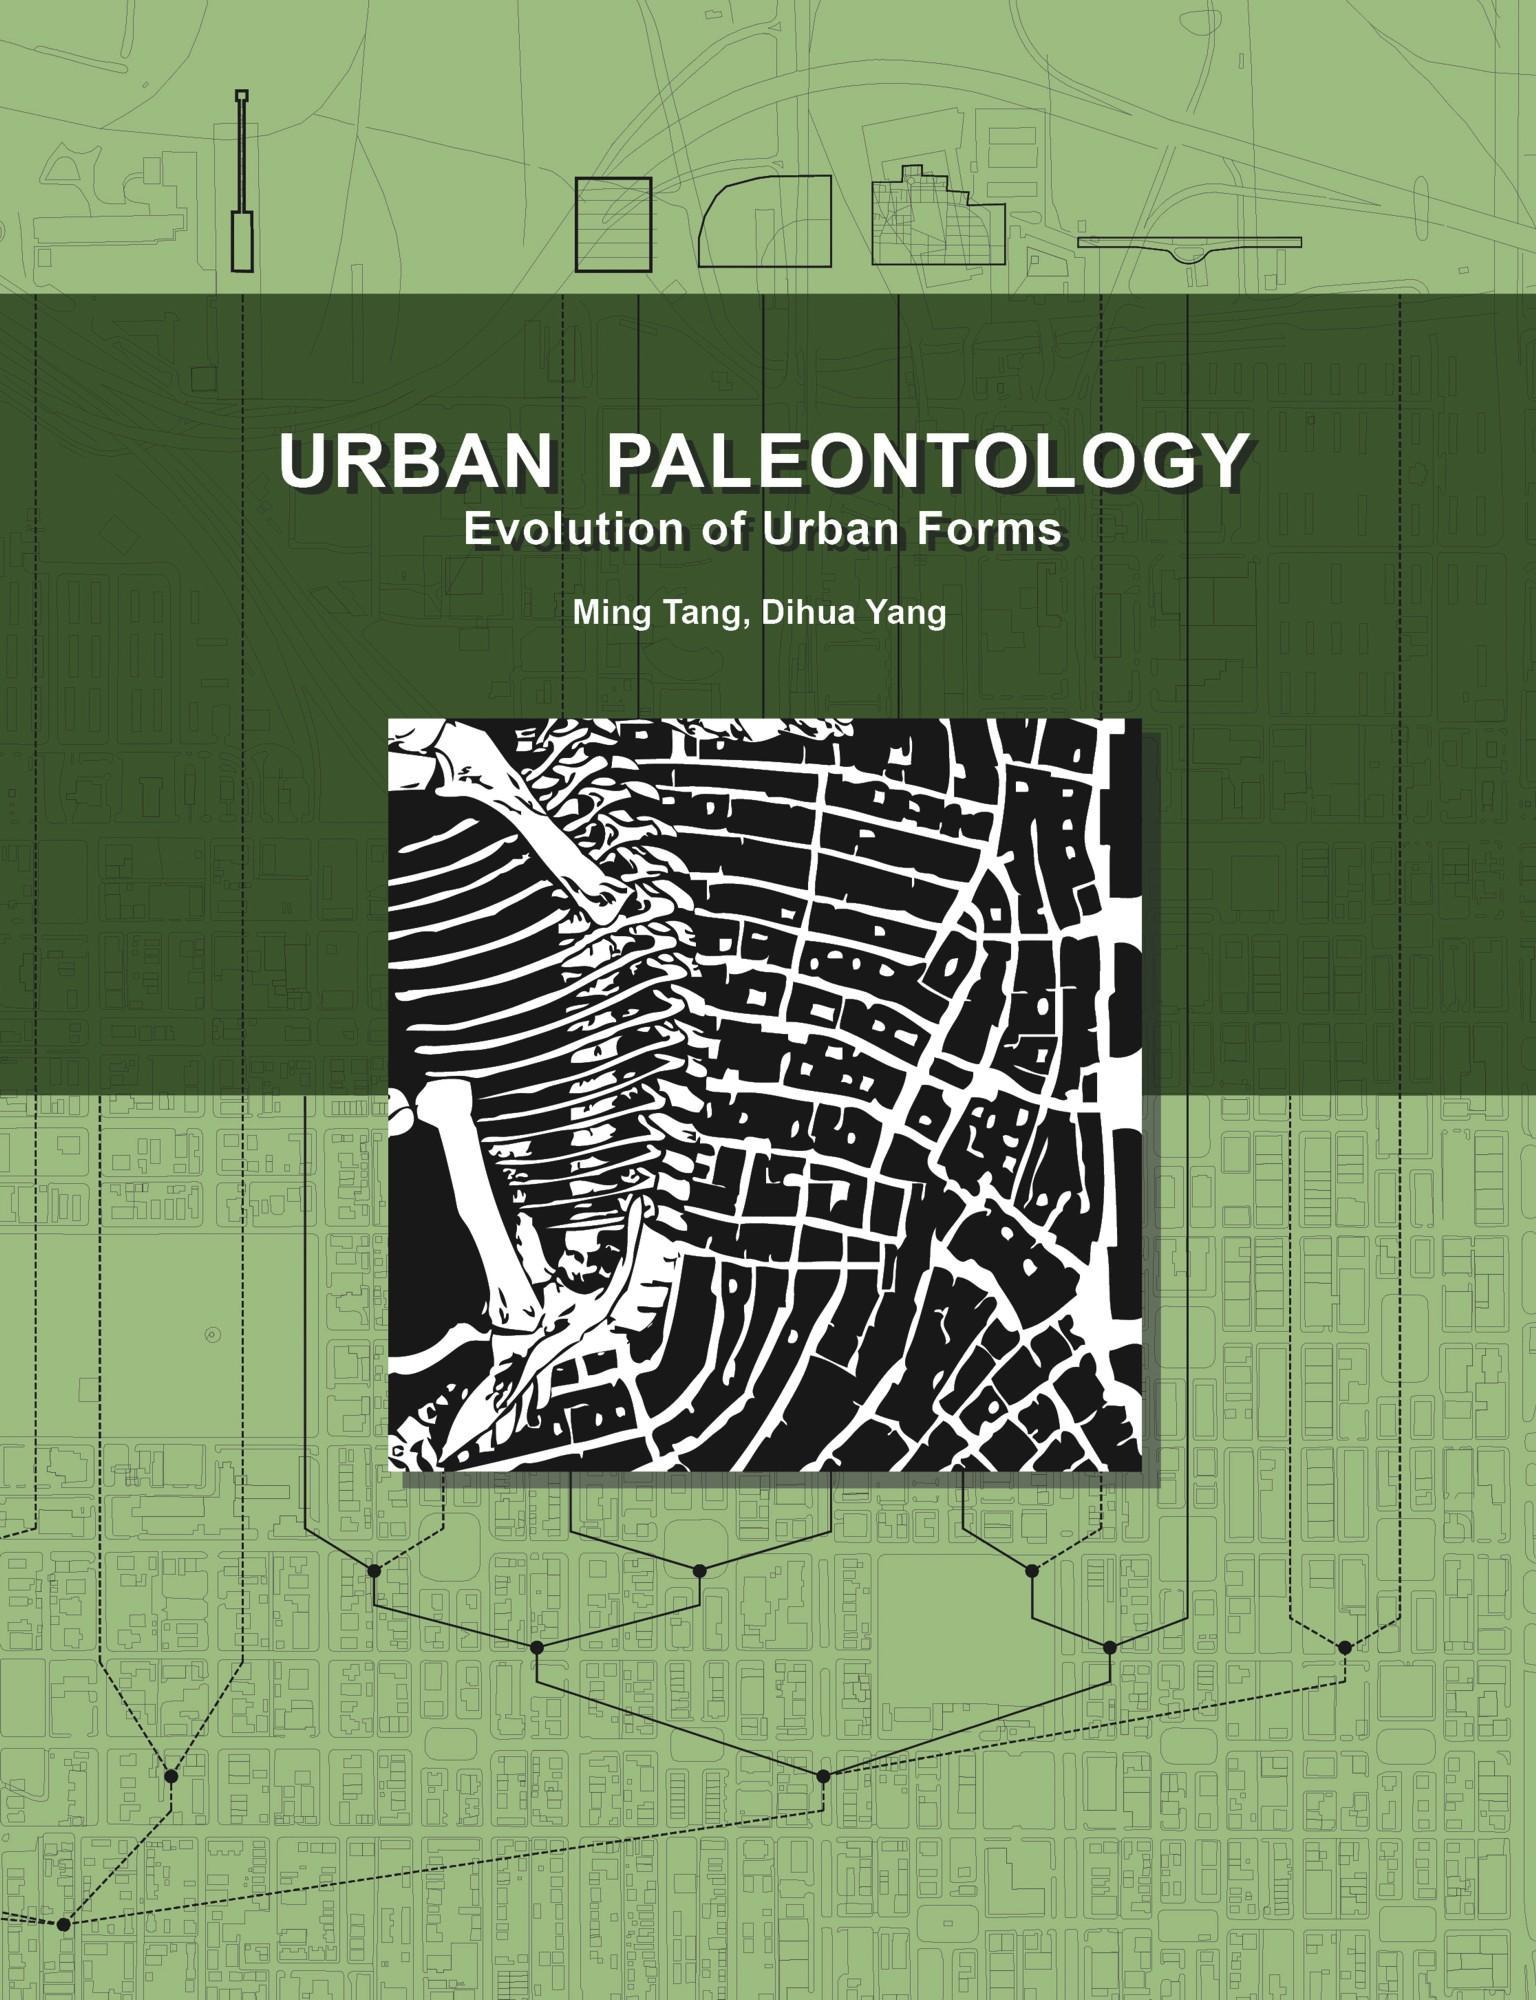 Urban Paleontology: Evolution of Urban Forms